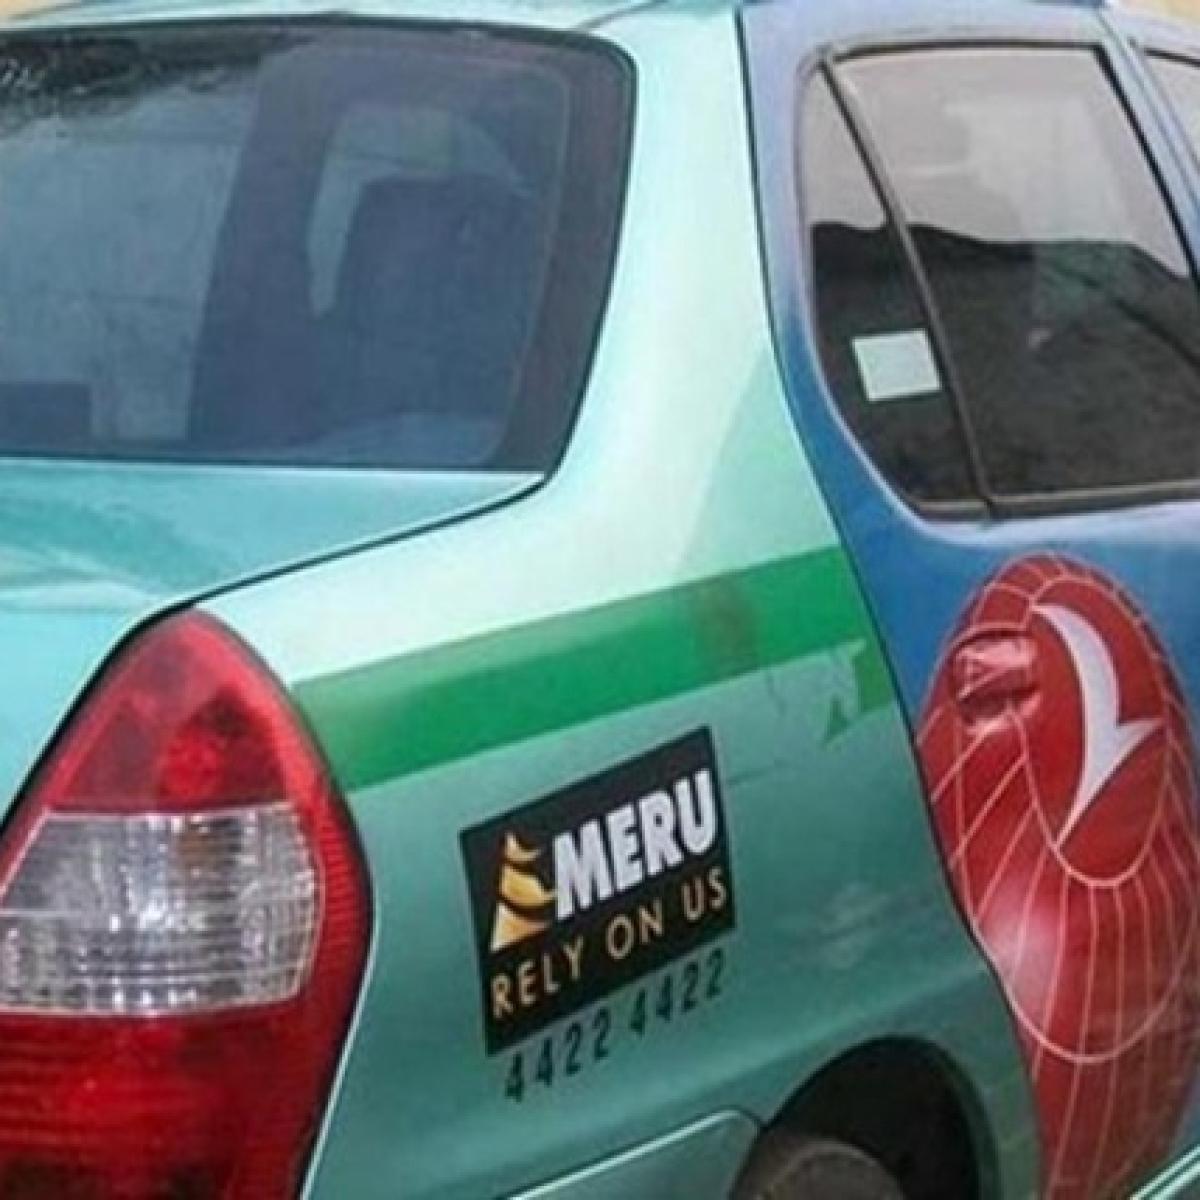 Mumbai: Soon, commuters arriving at CSMT can book Meru cabs via kiosks